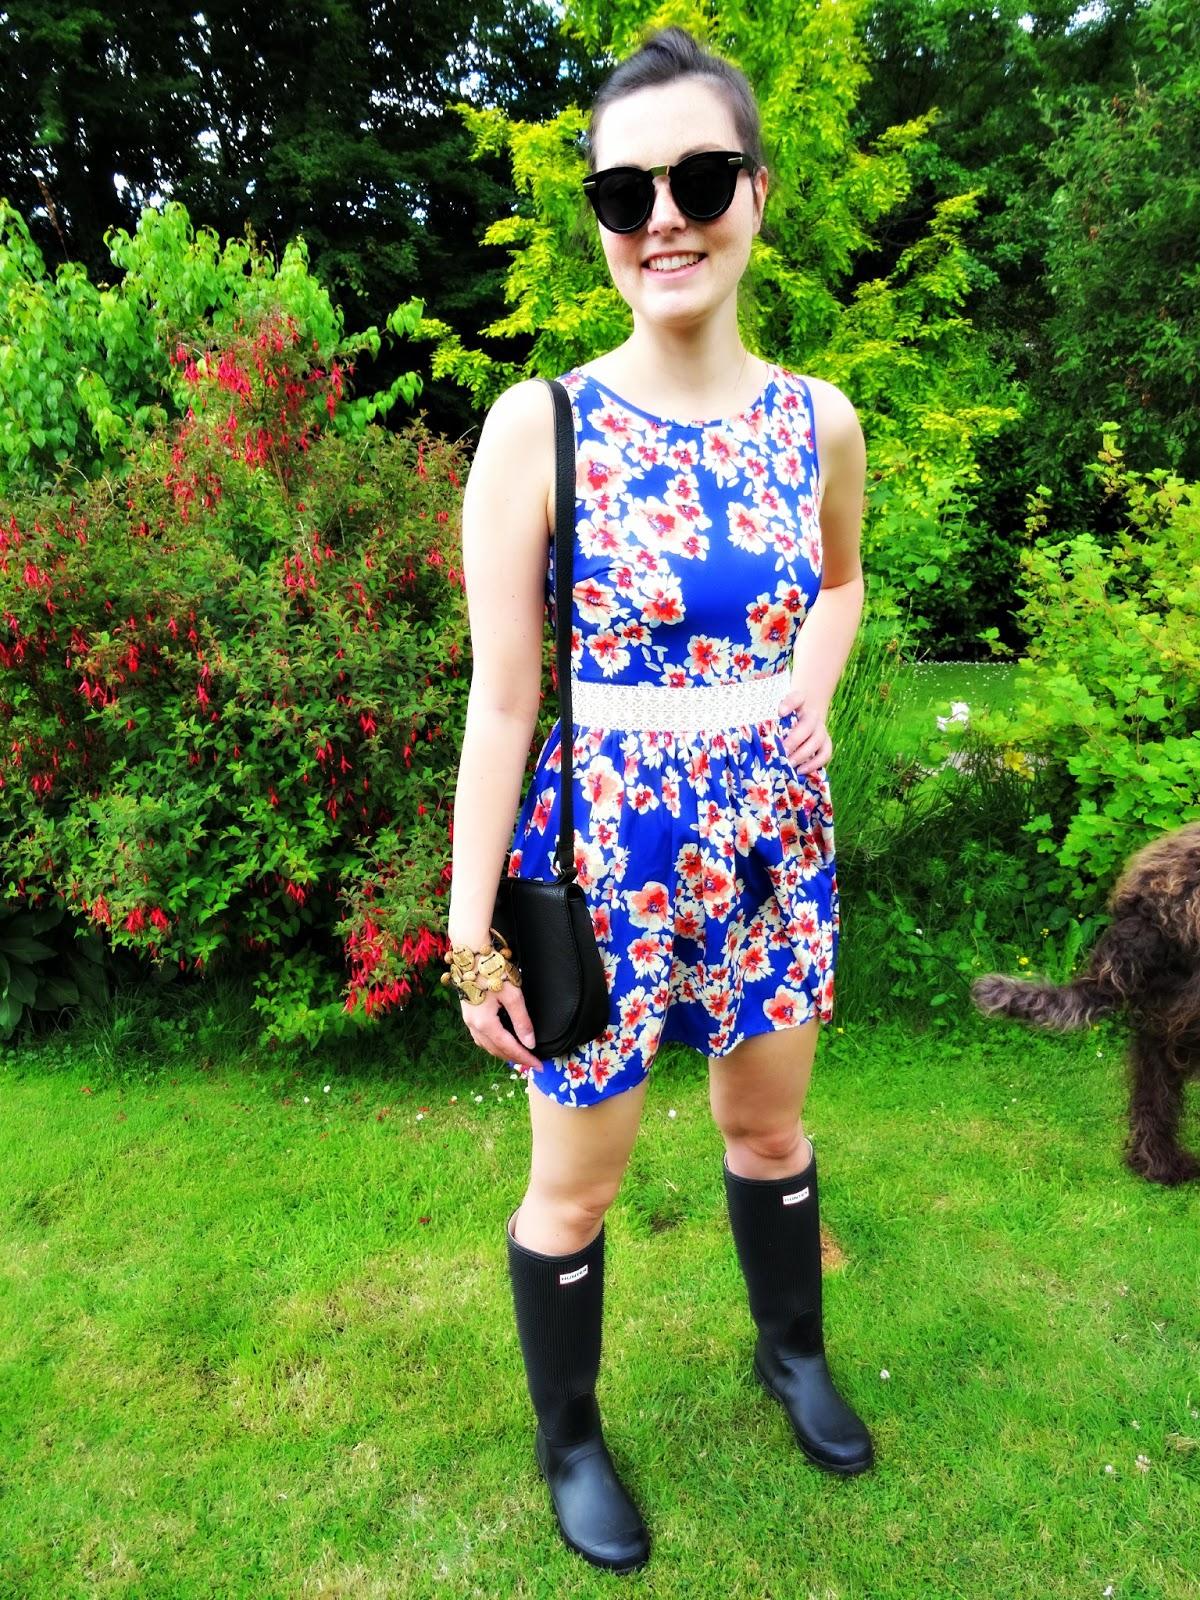 Glastonbury floral dress